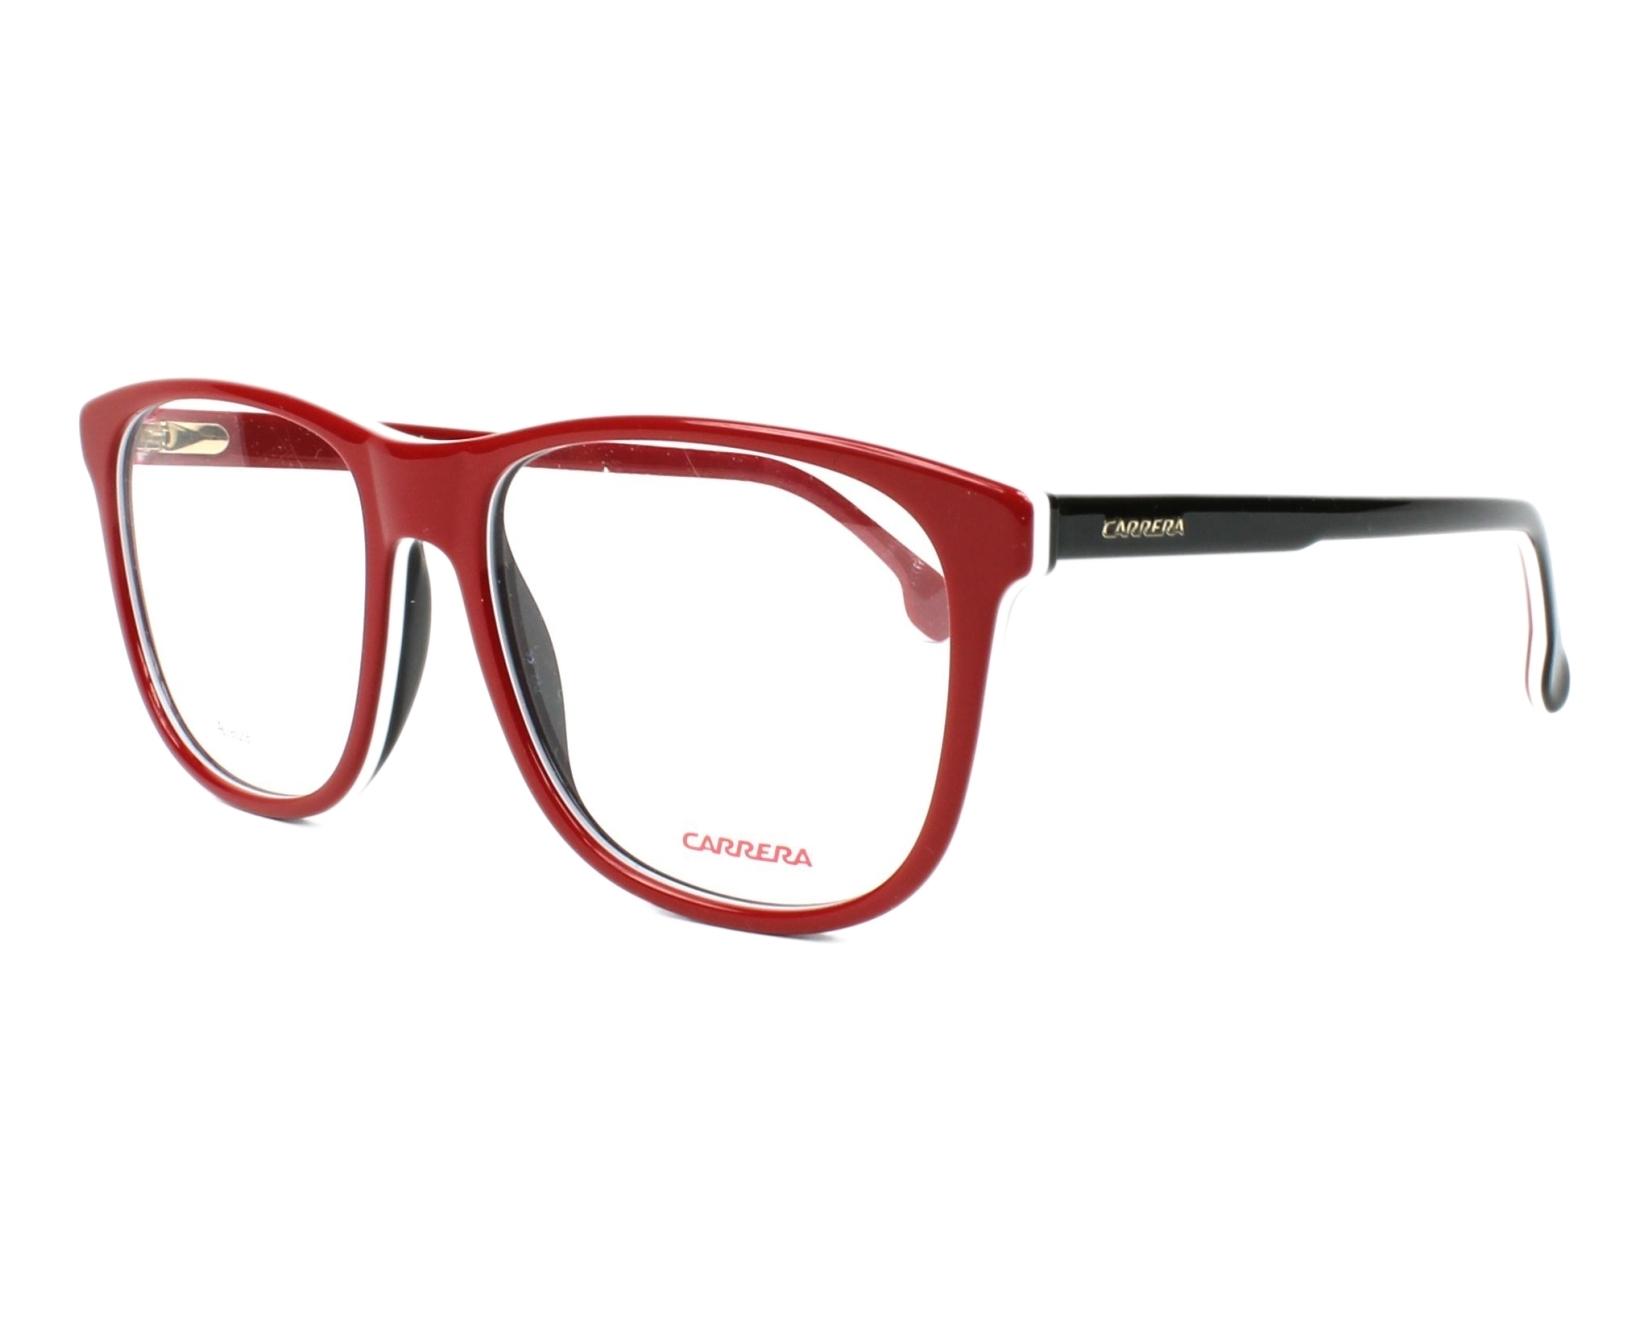 Carrera Eyewear Brille » CARRERA 1105/V«, rot, C9A - rot